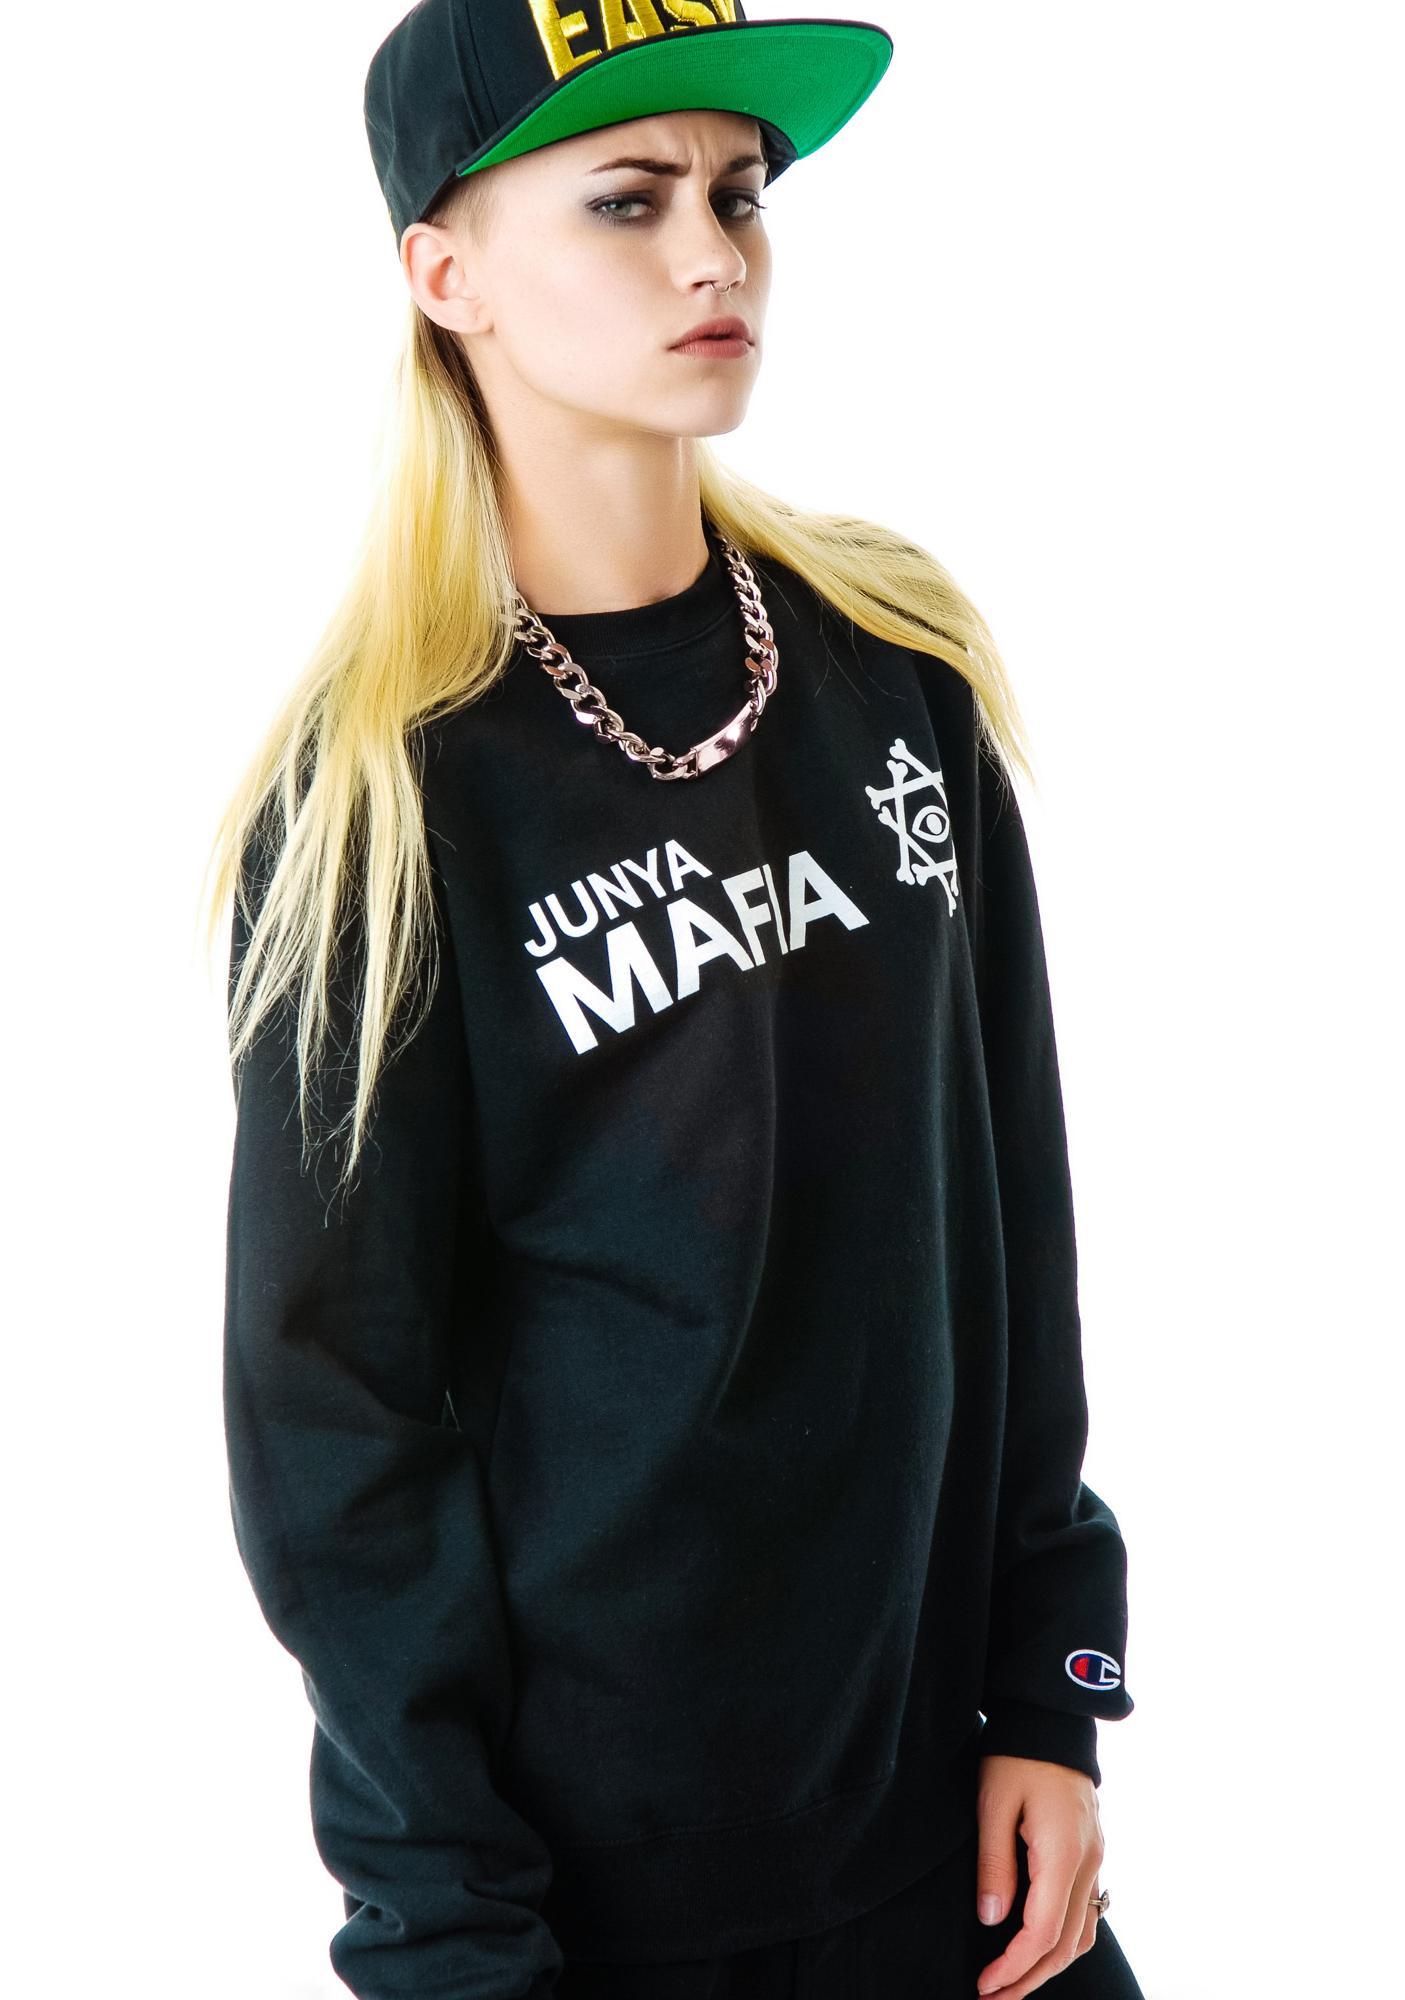 Junya Mafia Mafia Sweater